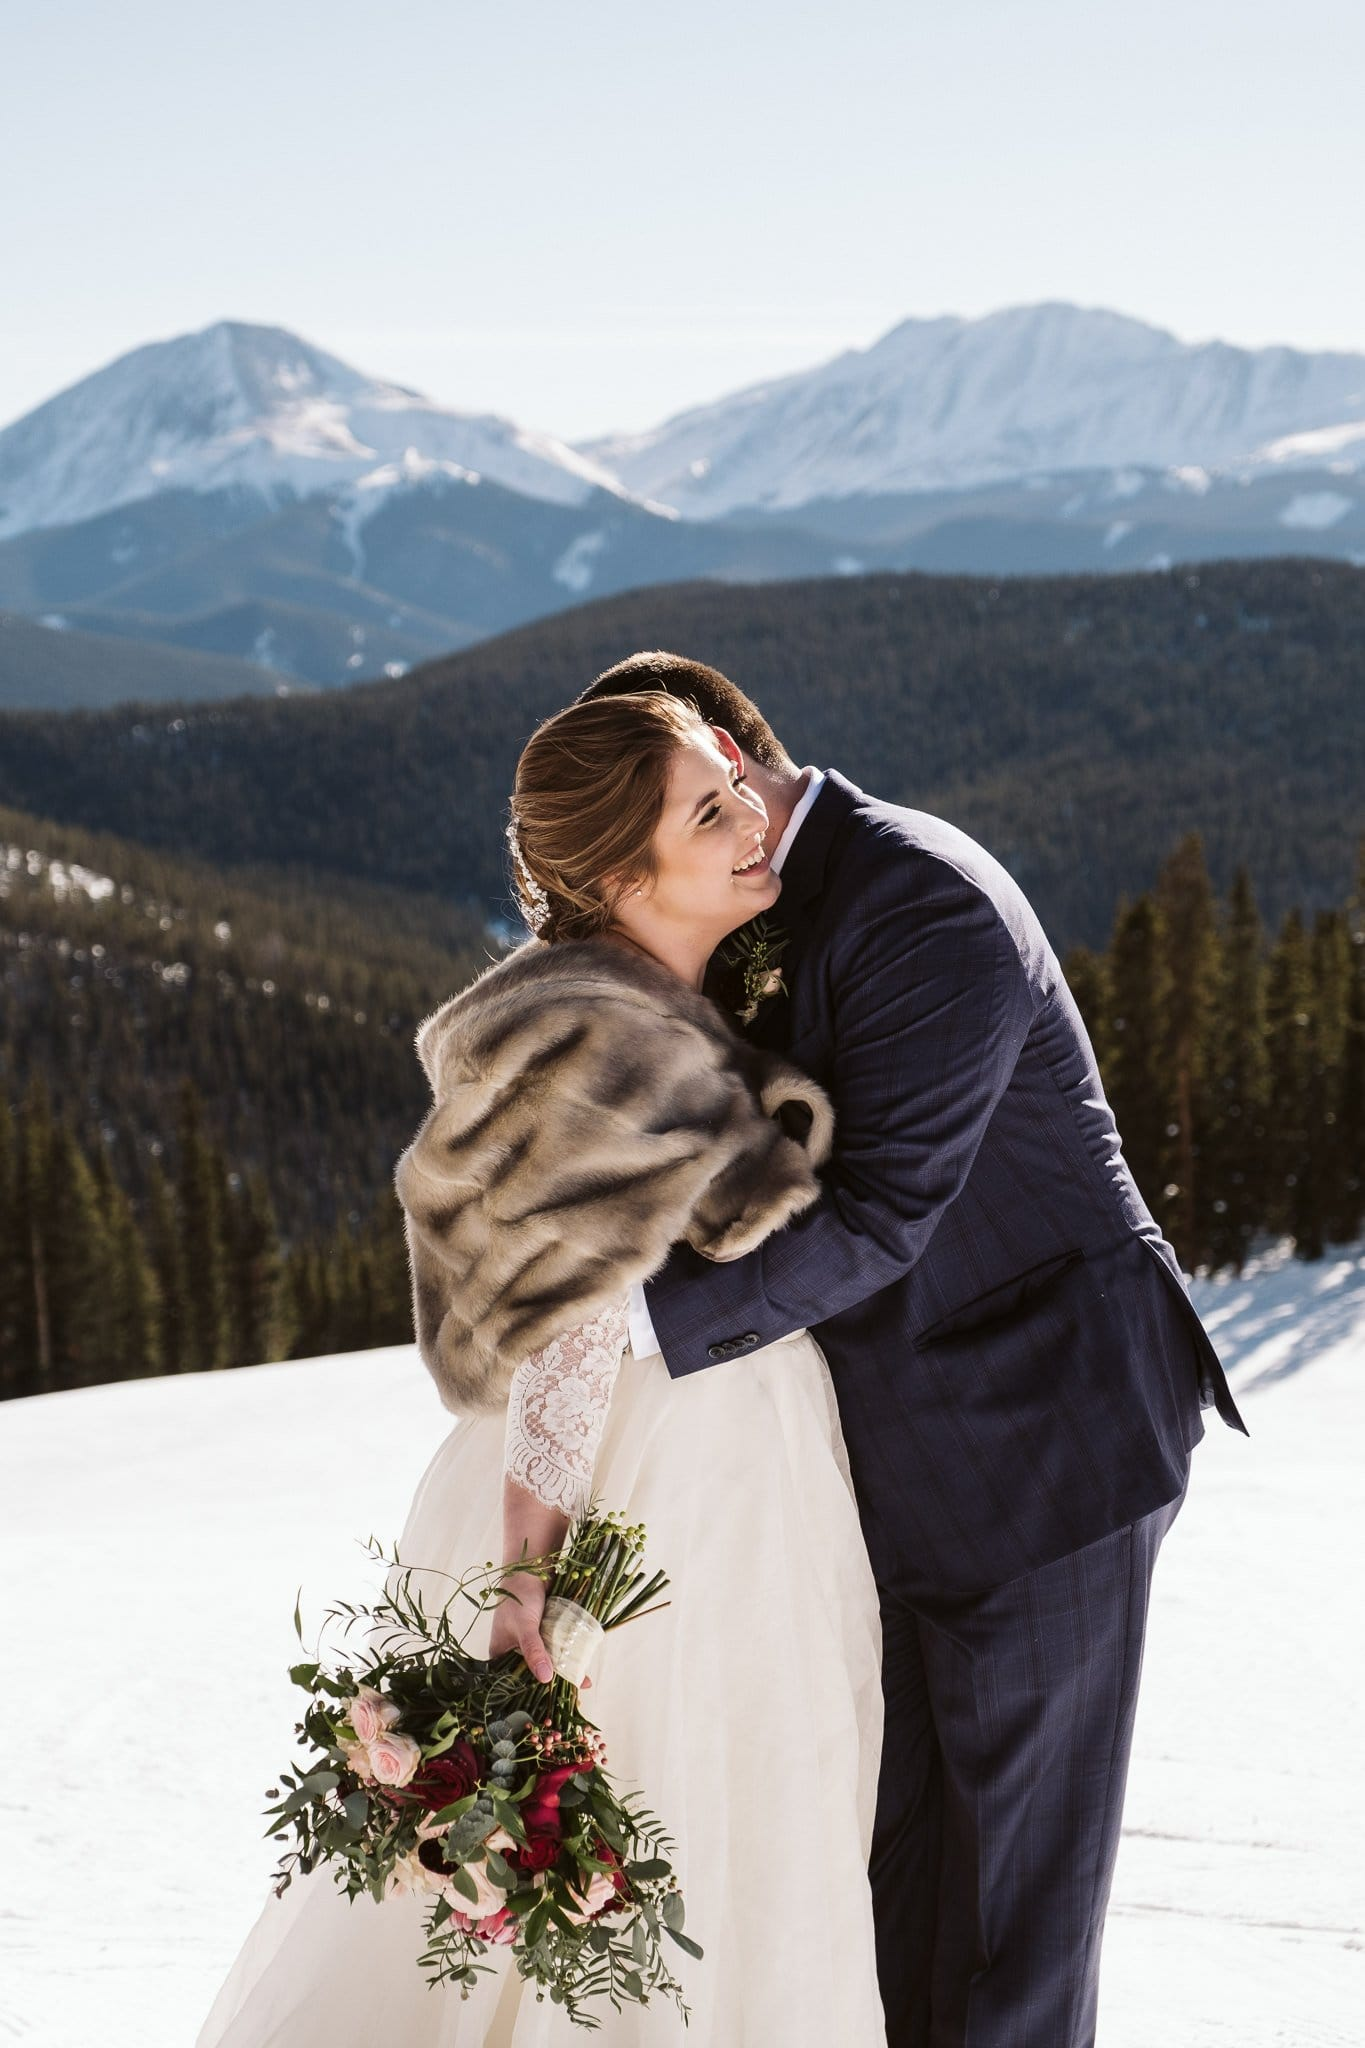 Winter elopement on the slopes of Keystone Ski Resort in Colorado.